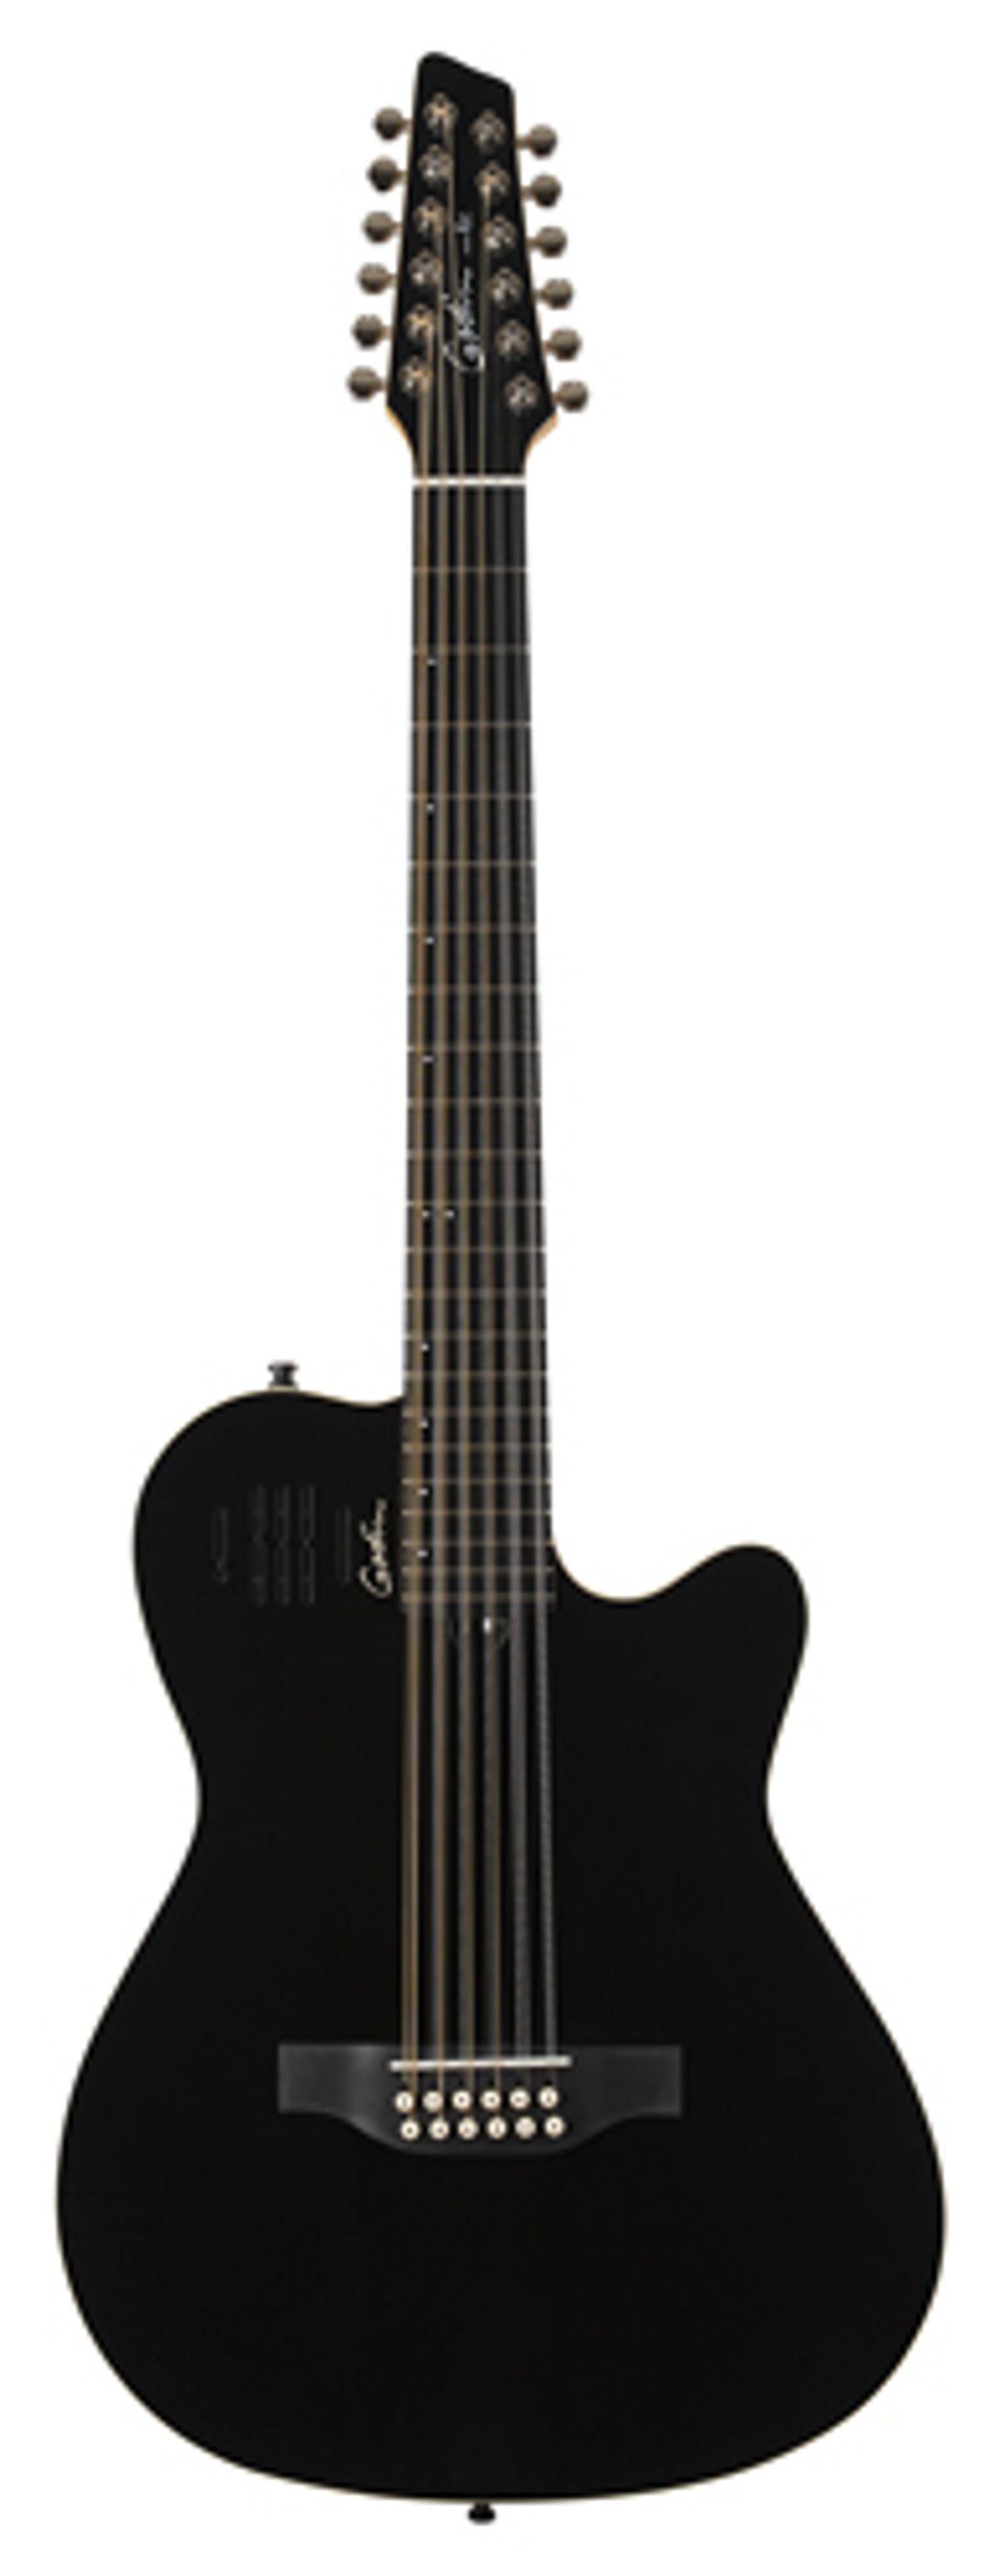 Godin Guitars Releases the A12 Black